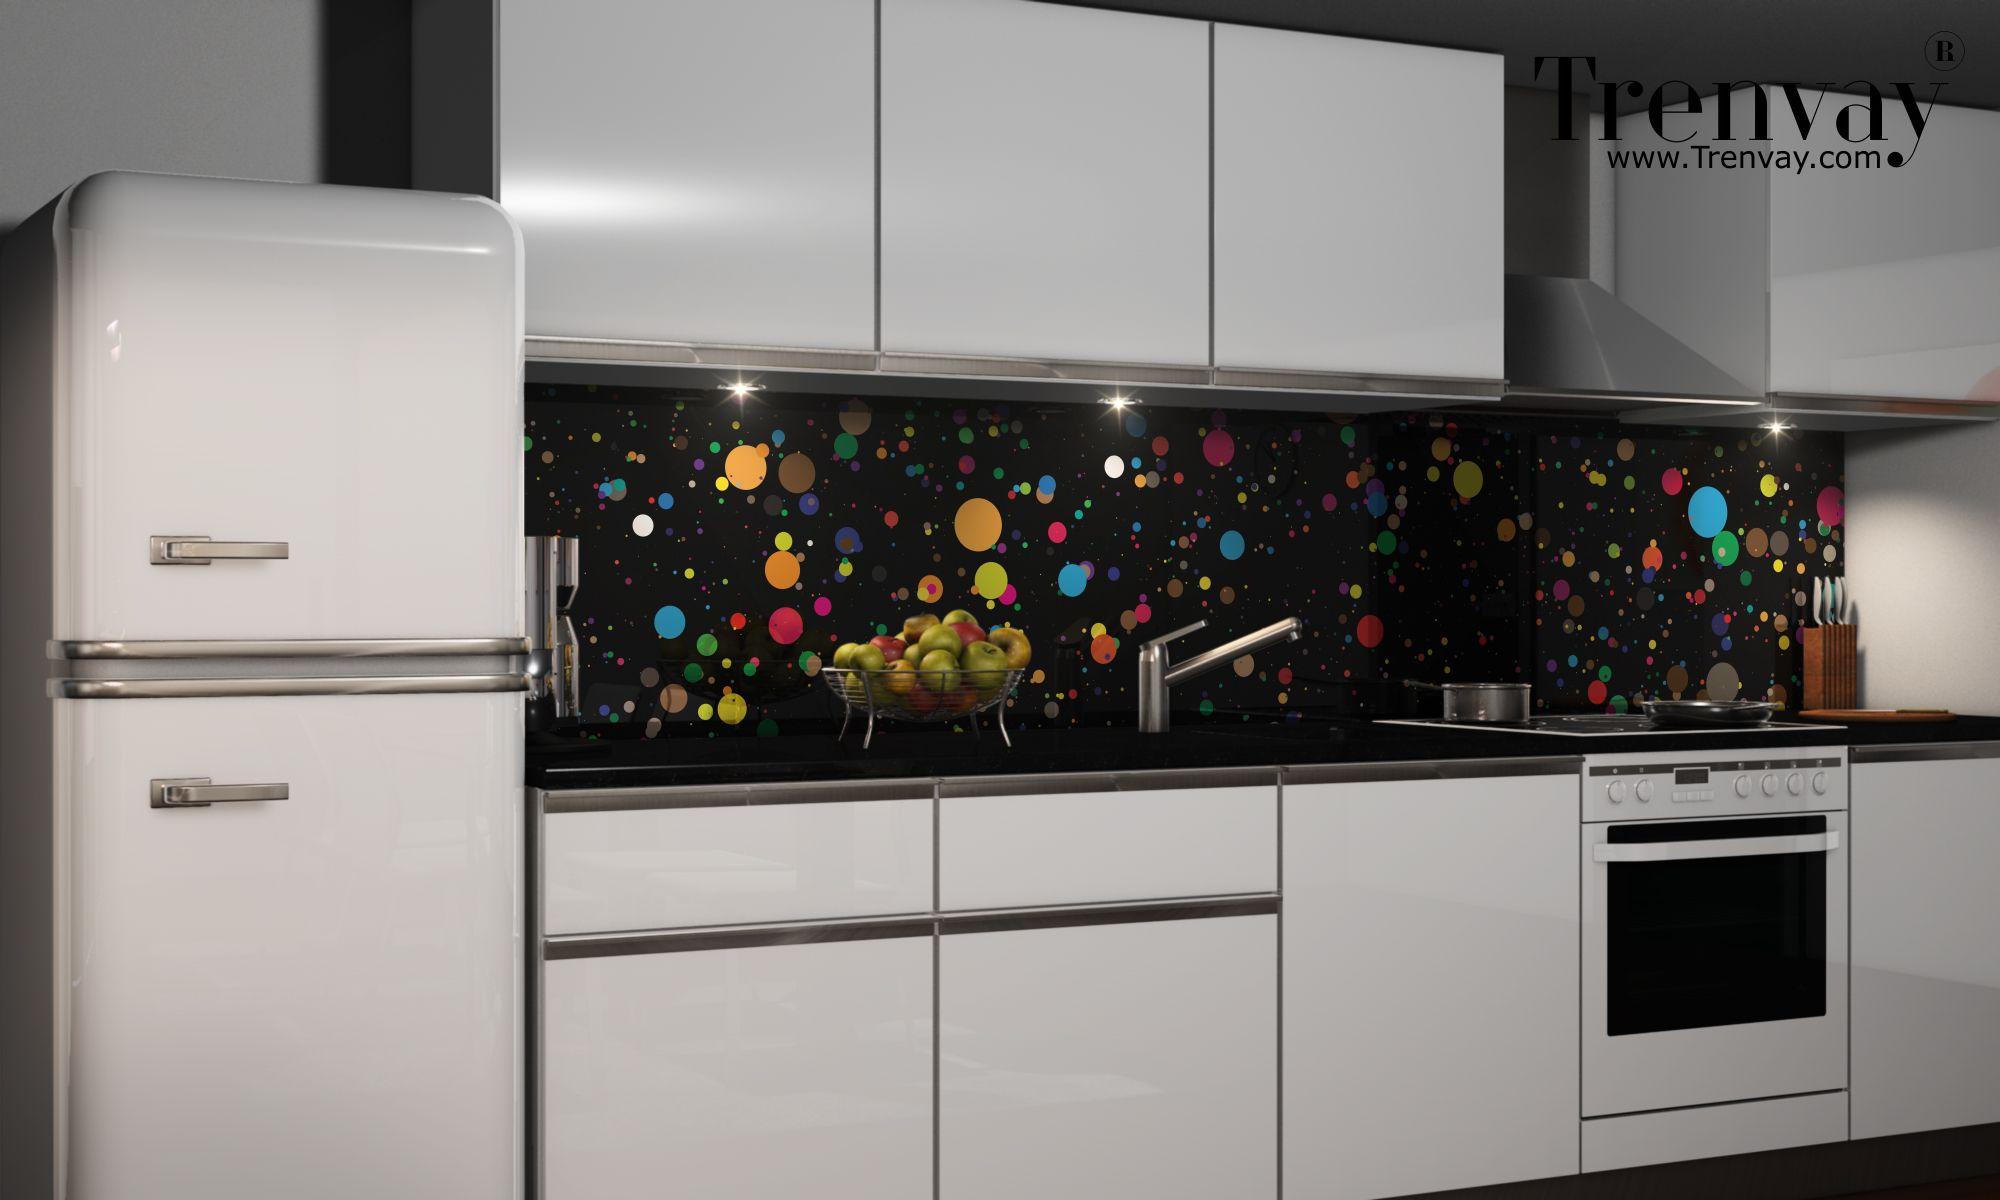 Küchenrückwand Selbstklebend ~ Http: www.trenvay.com mutfak fayans folyo bulancak pmu86953